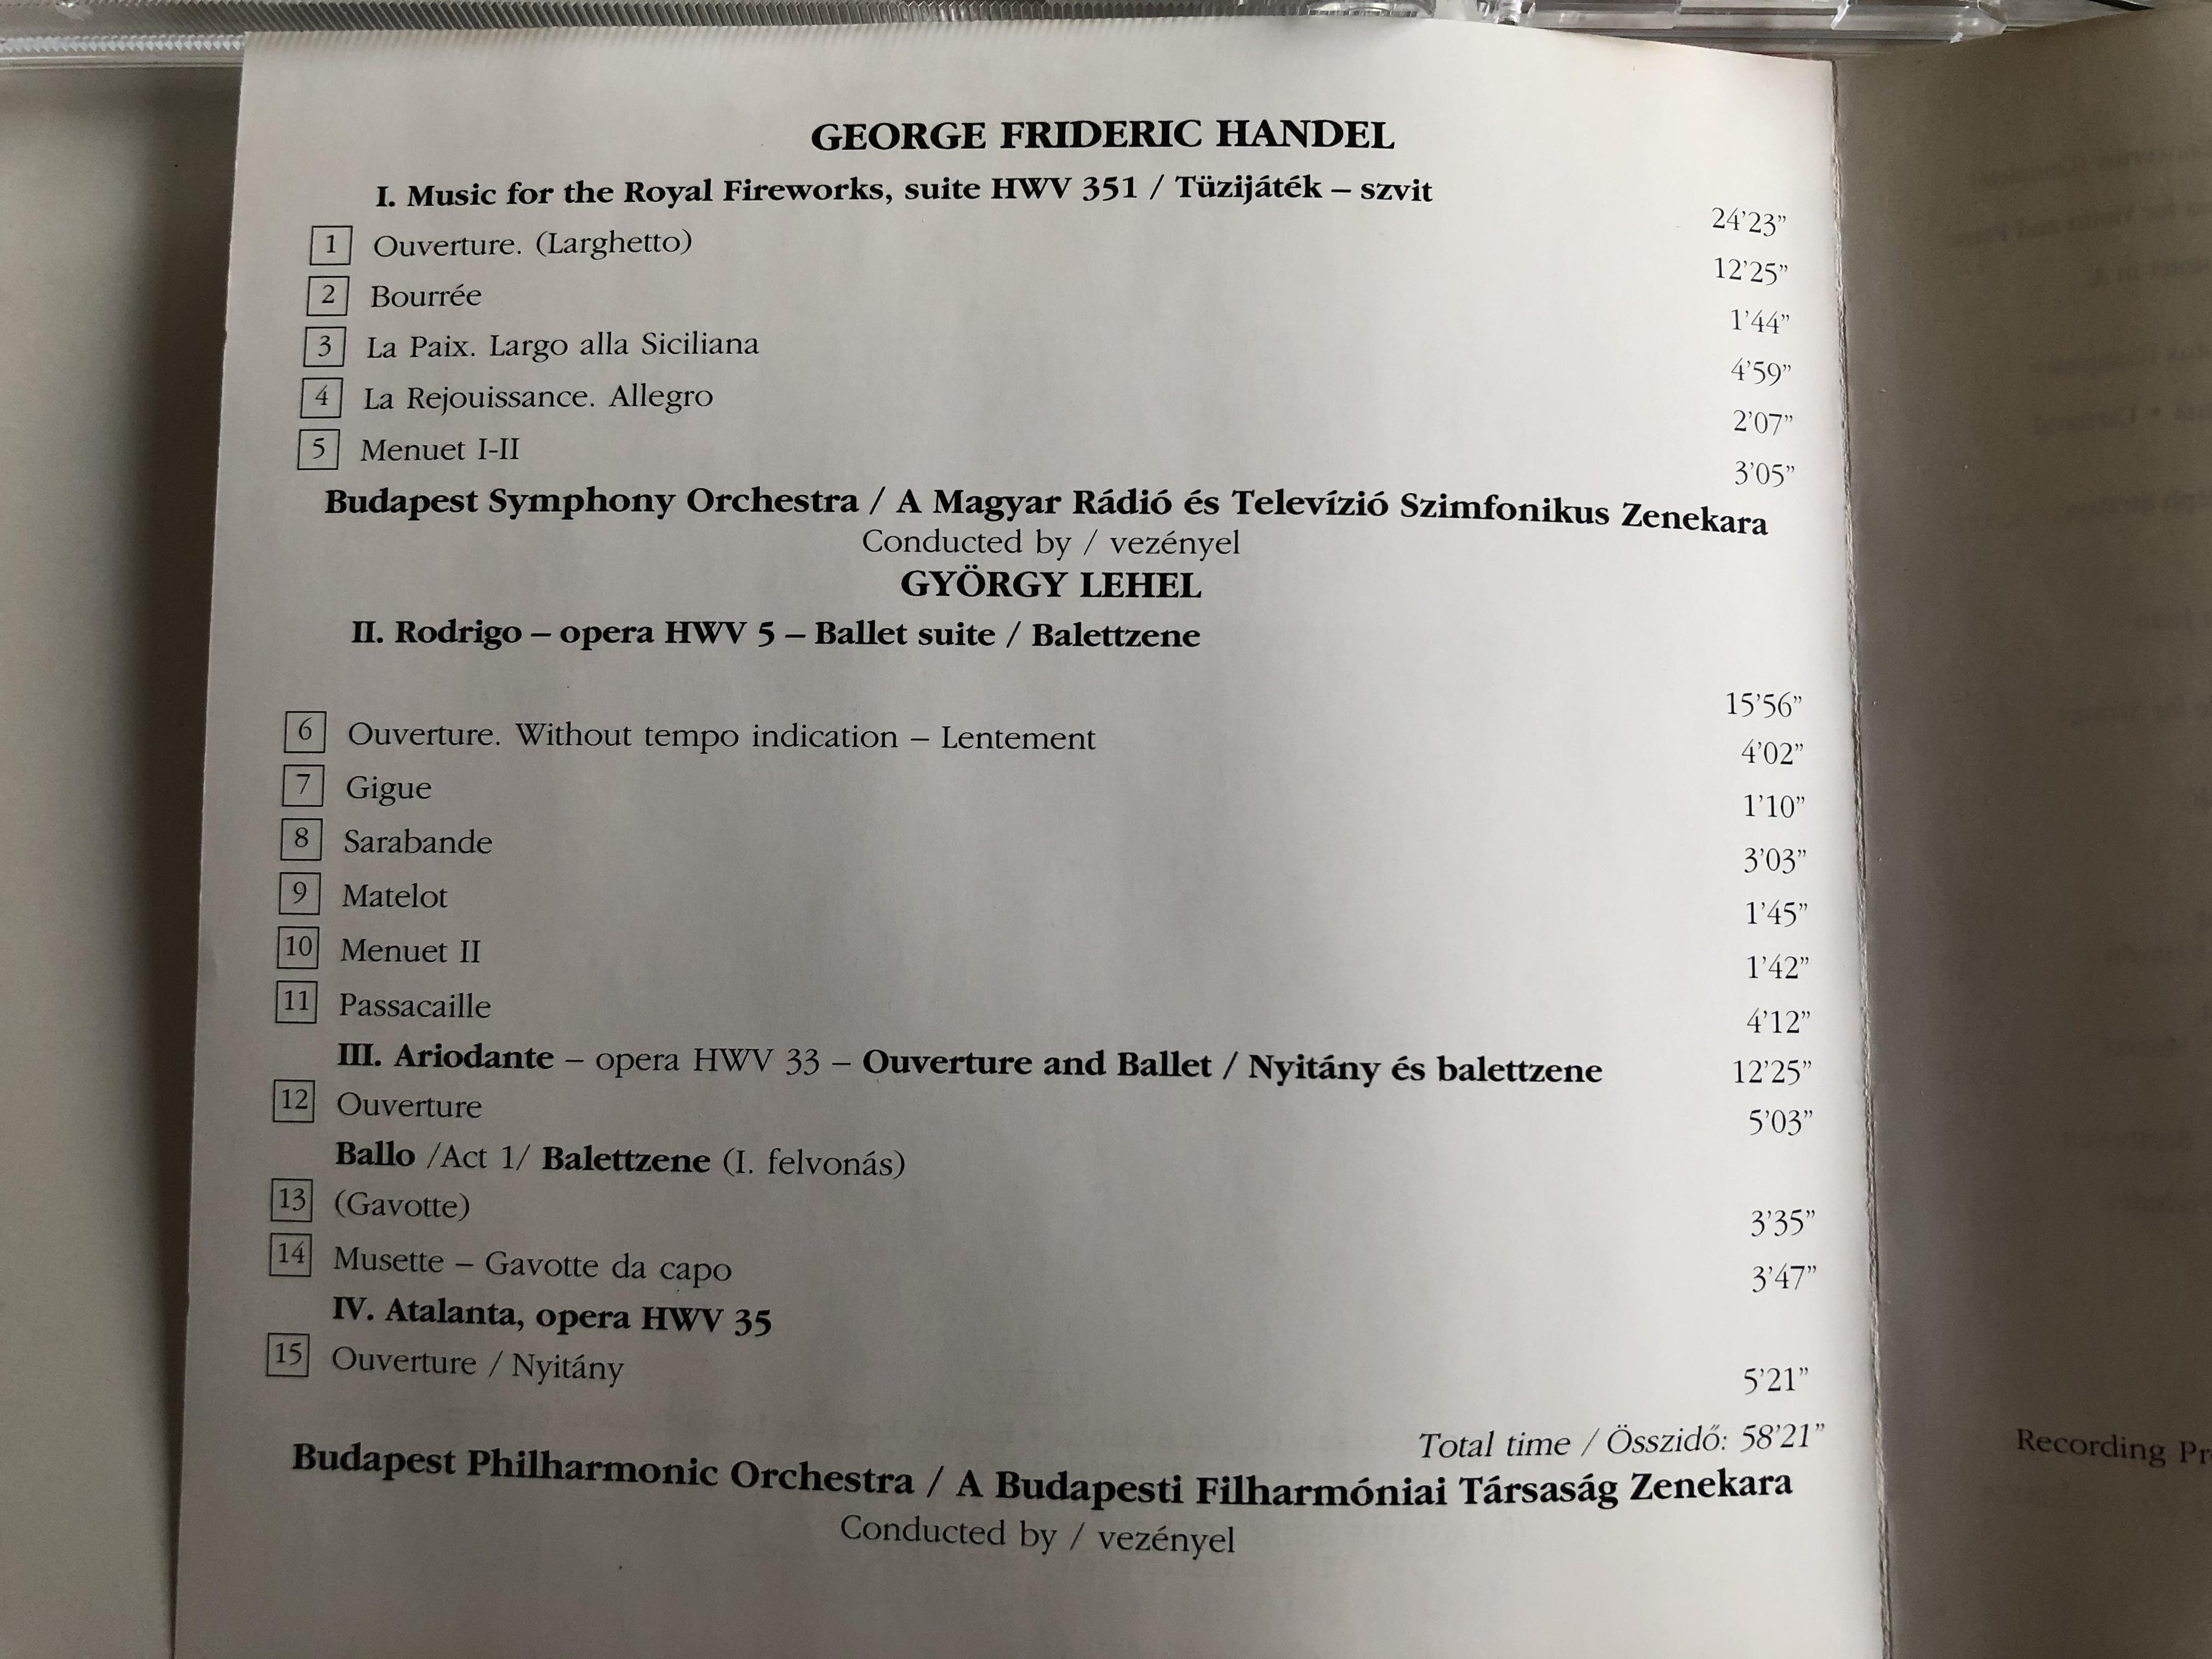 h-ndel-music-for-the-royal-fireworks-ouvertures-rodrigo-ariodante-atalanta-budapest-symphony-orchestra-gy-rgy-lehel-budapest-philharmonic-orchestra-mikl-s-erd-lyi-hungaroton-classic-.jpg